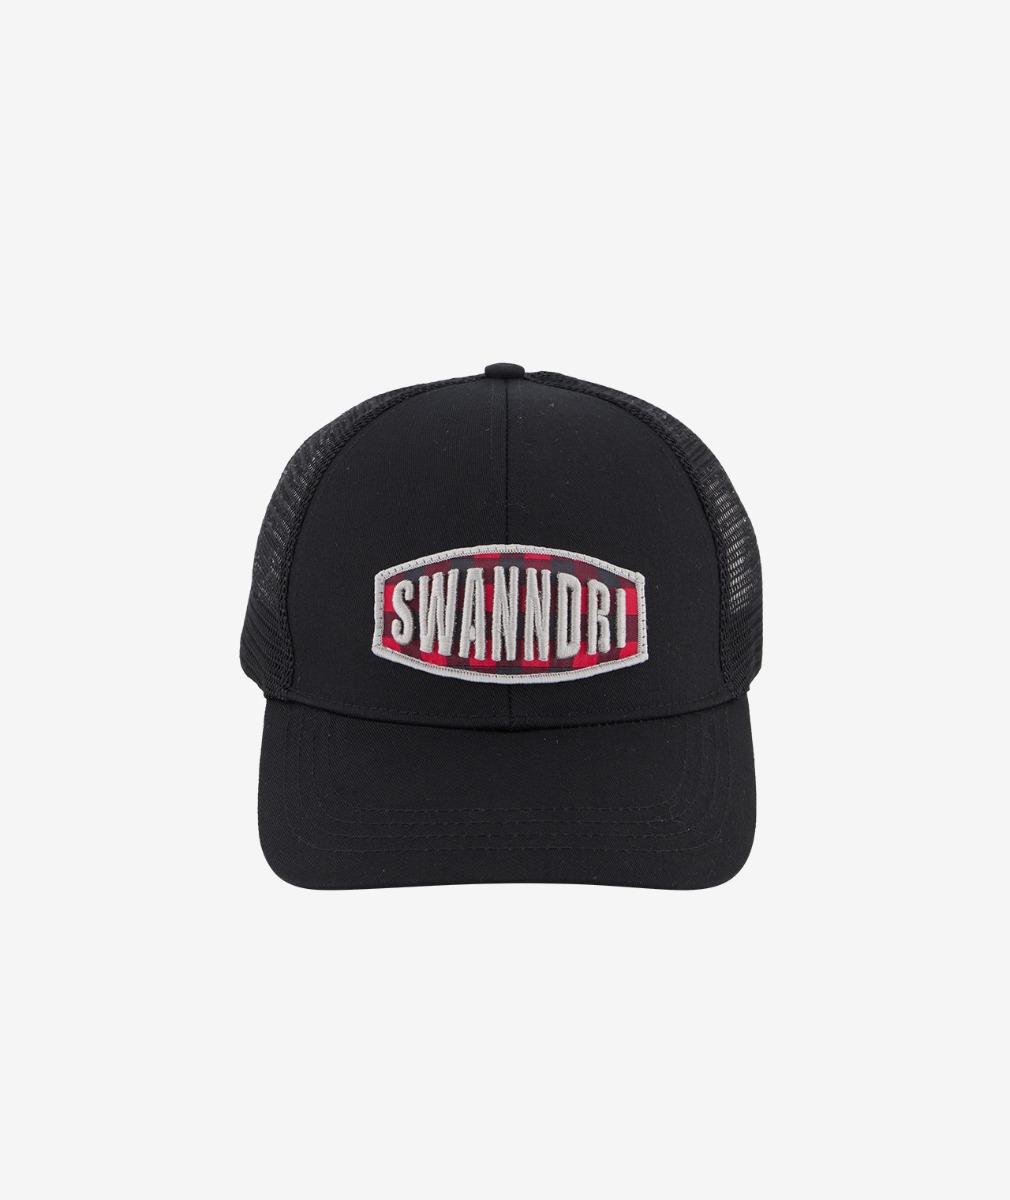 Swanndri Red Beach Trucker Cap in Black/Black